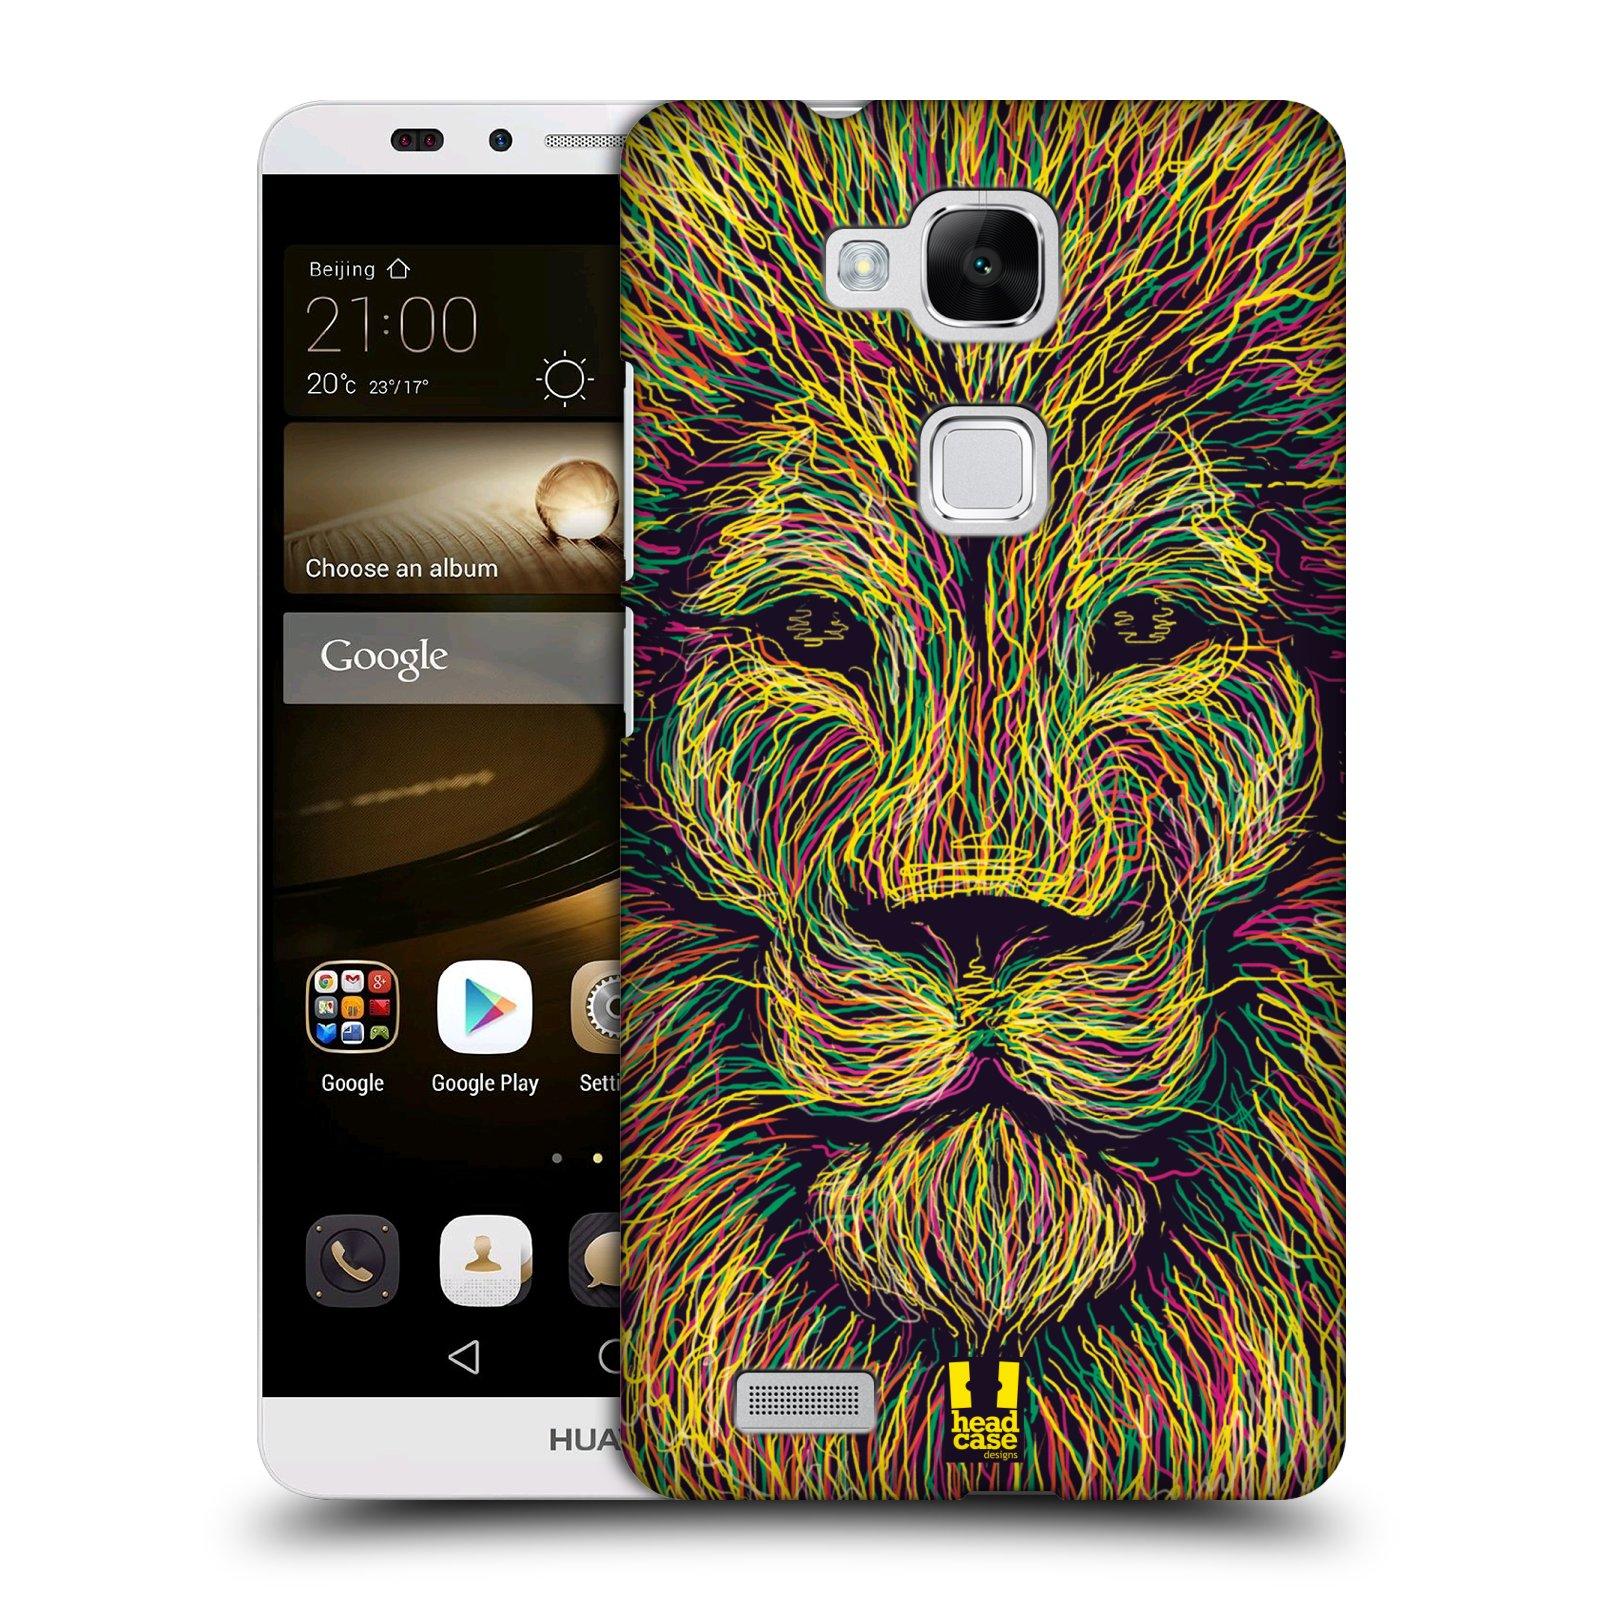 HEAD CASE plastový obal na mobil Huawei Mate 7 vzor zvíře čmáranice lev